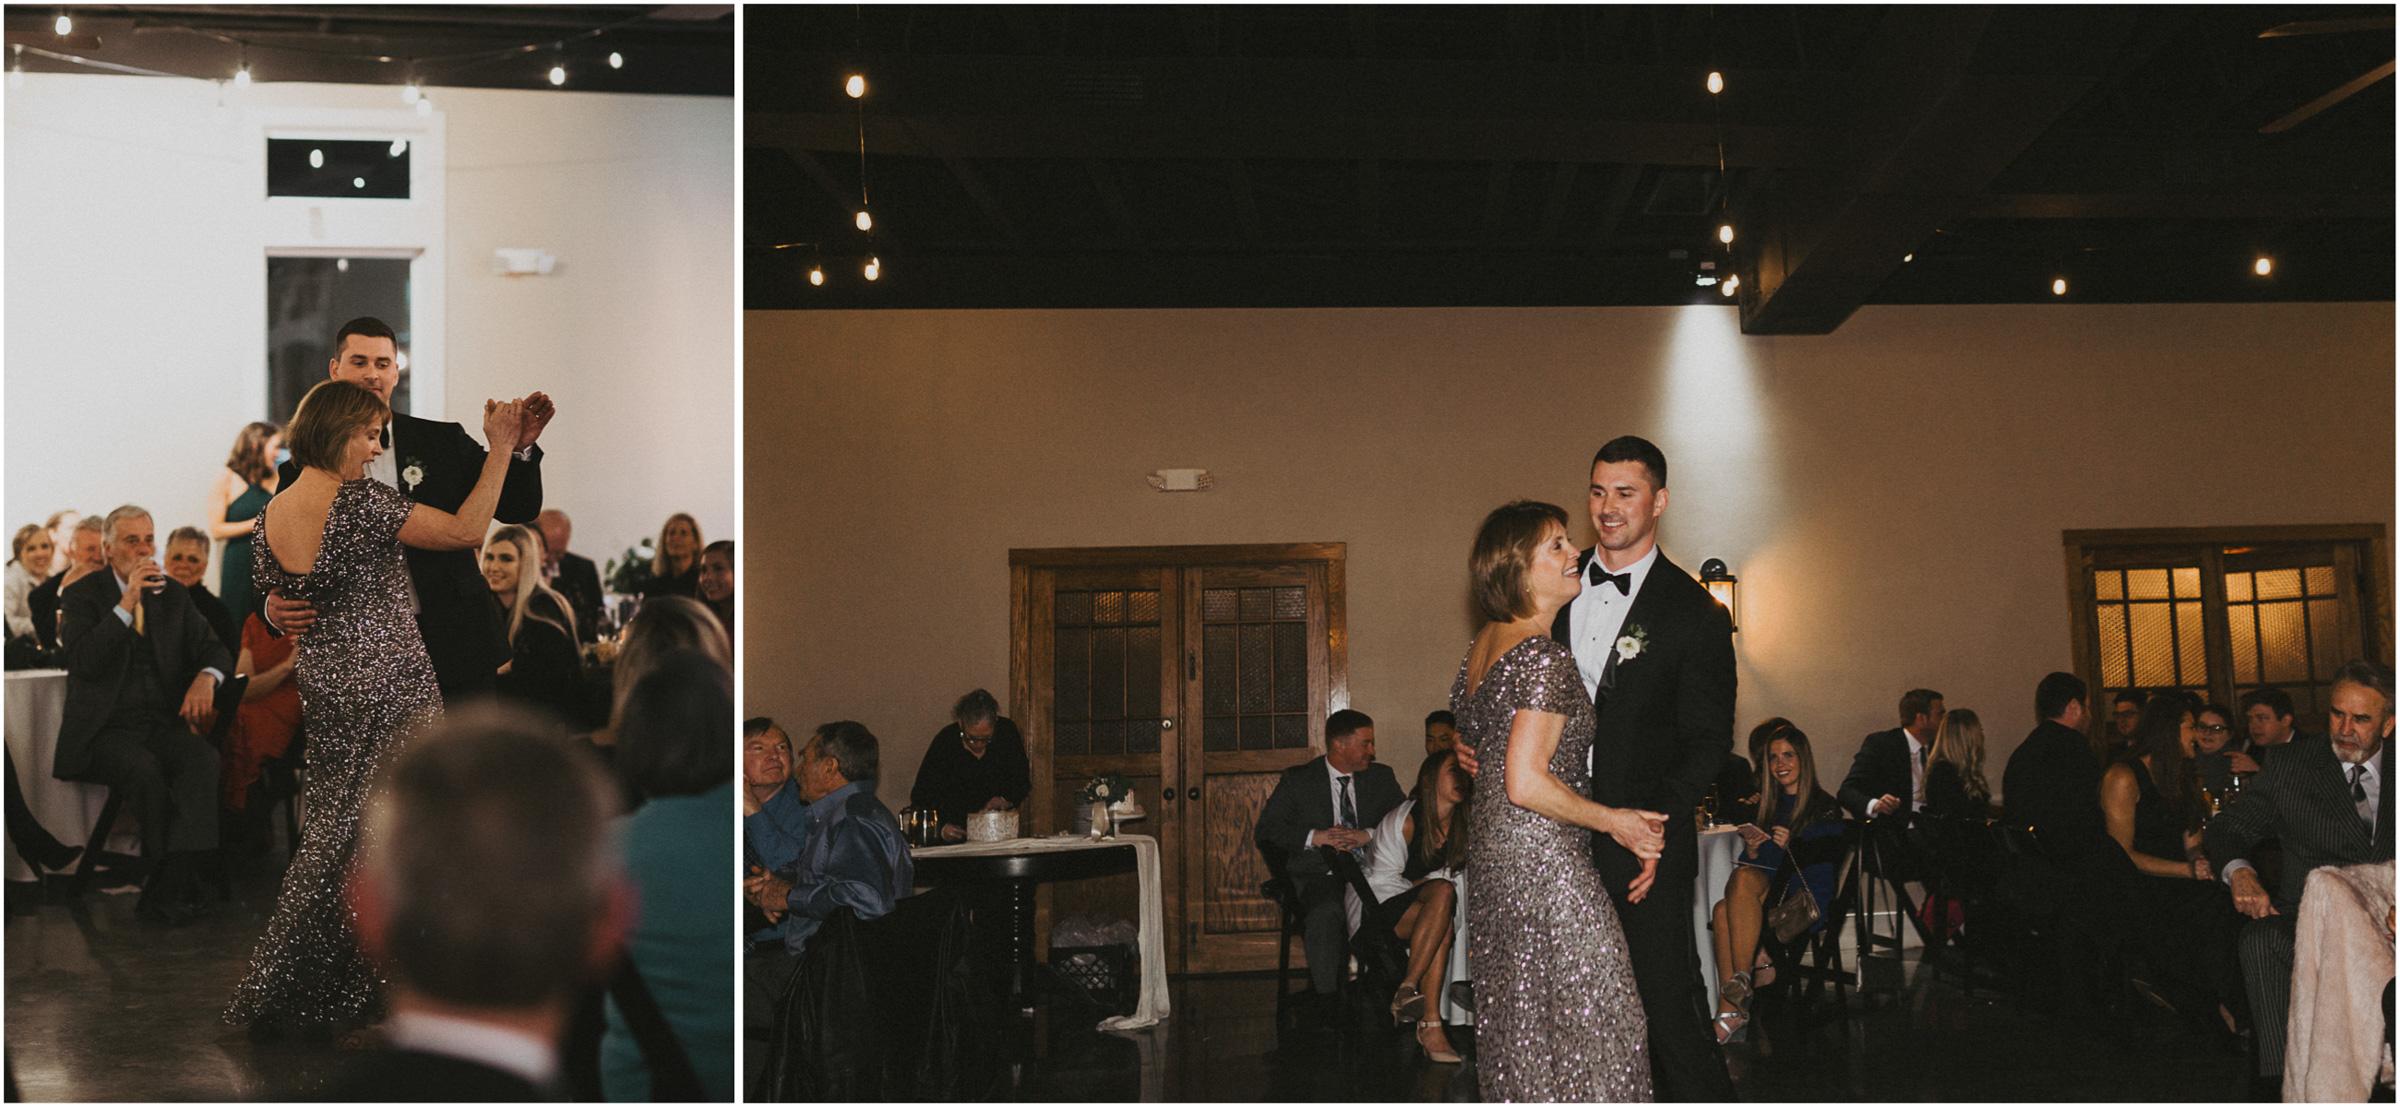 alyssa barletter photography shawnee mission park winter wedding 8th and main grandview missouri photographer-65.jpg